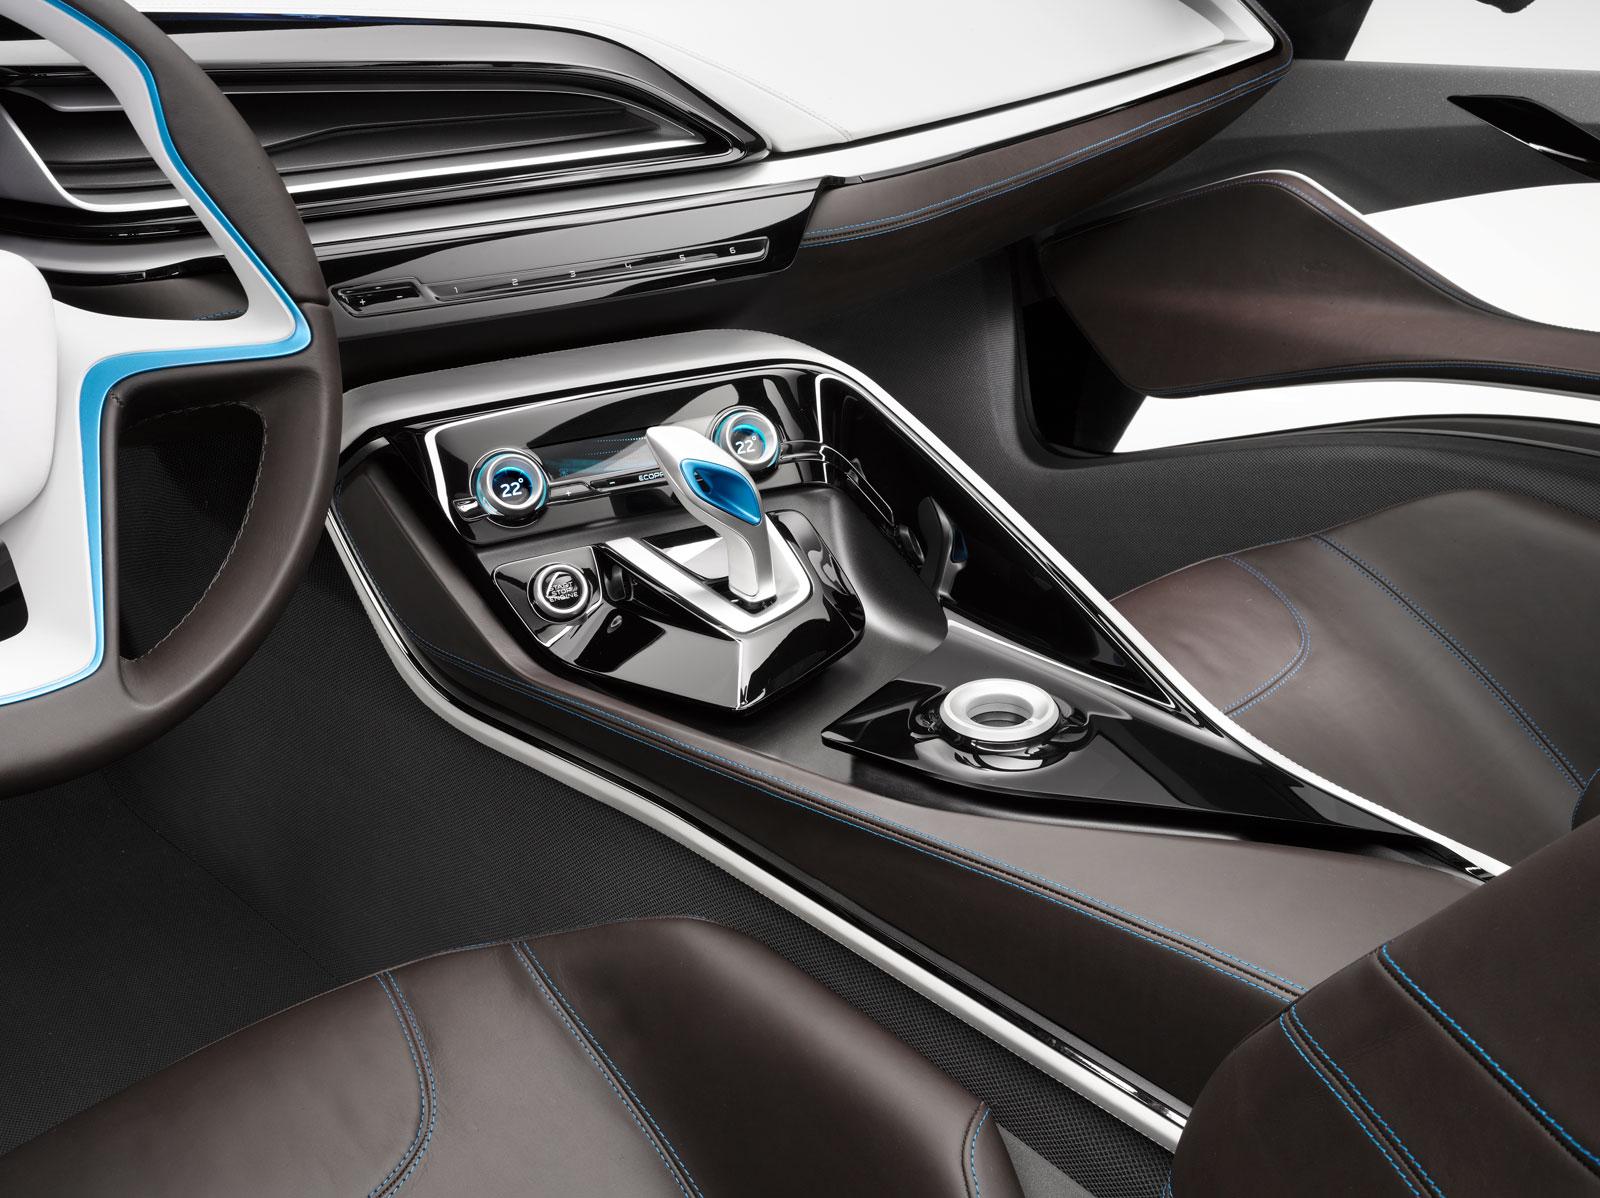 bmw i8 concept interior car body design. Black Bedroom Furniture Sets. Home Design Ideas